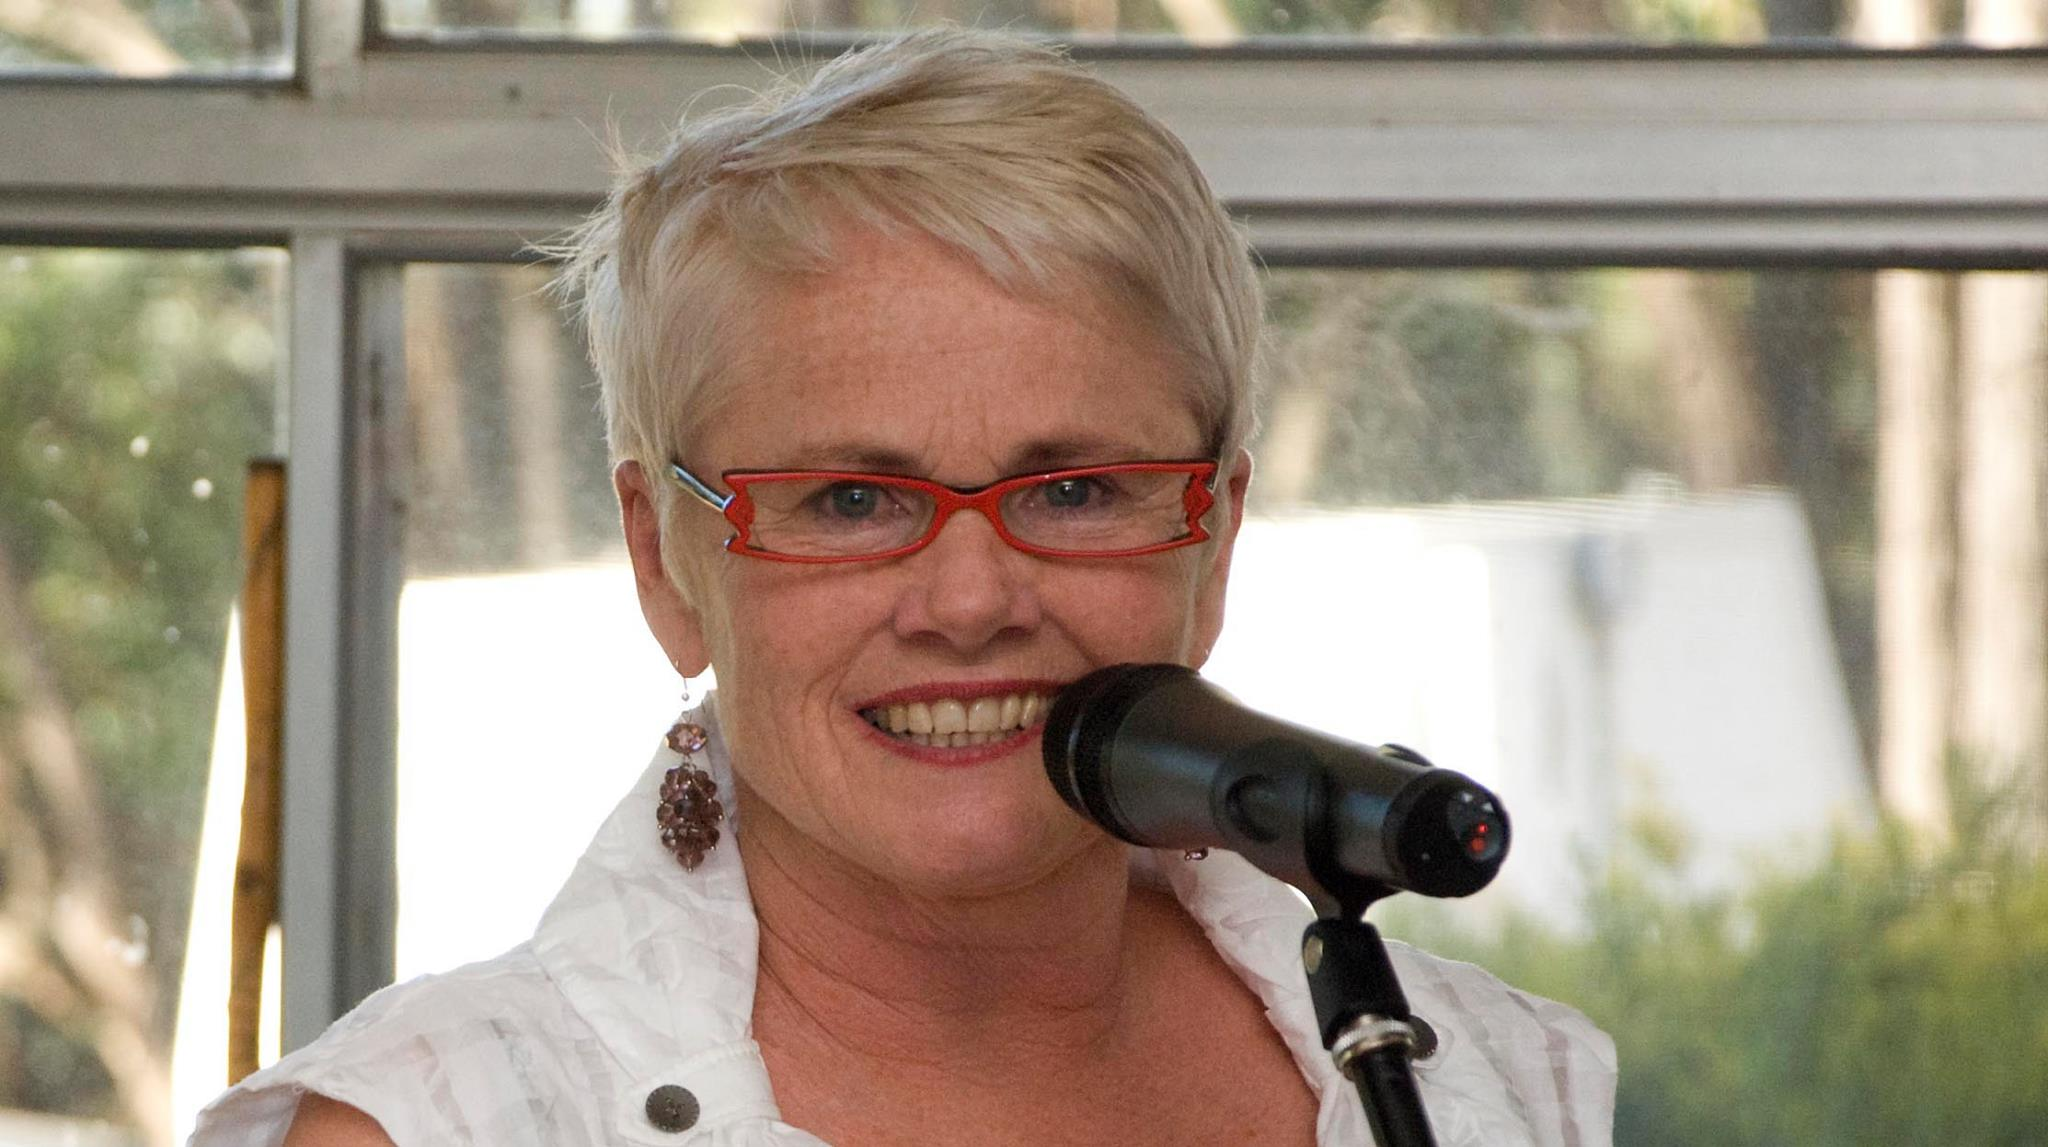 Noelene Gration with Microphone Public Speaking